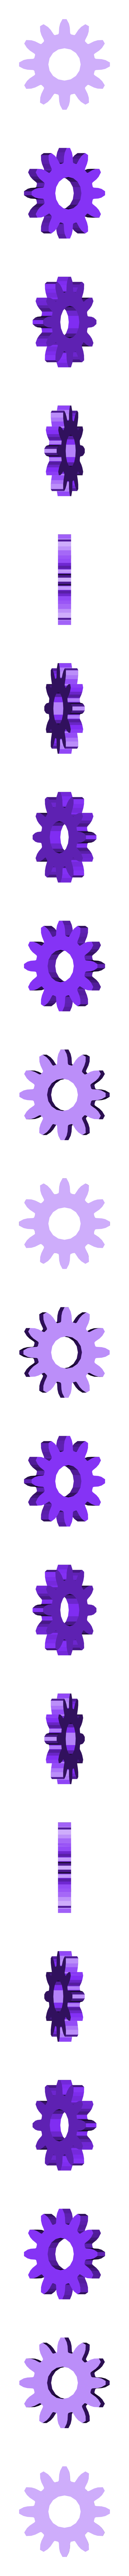 ing cover 9.stl Download free STL file cover gears for xiaomi mi A1 • 3D print object, Delli98